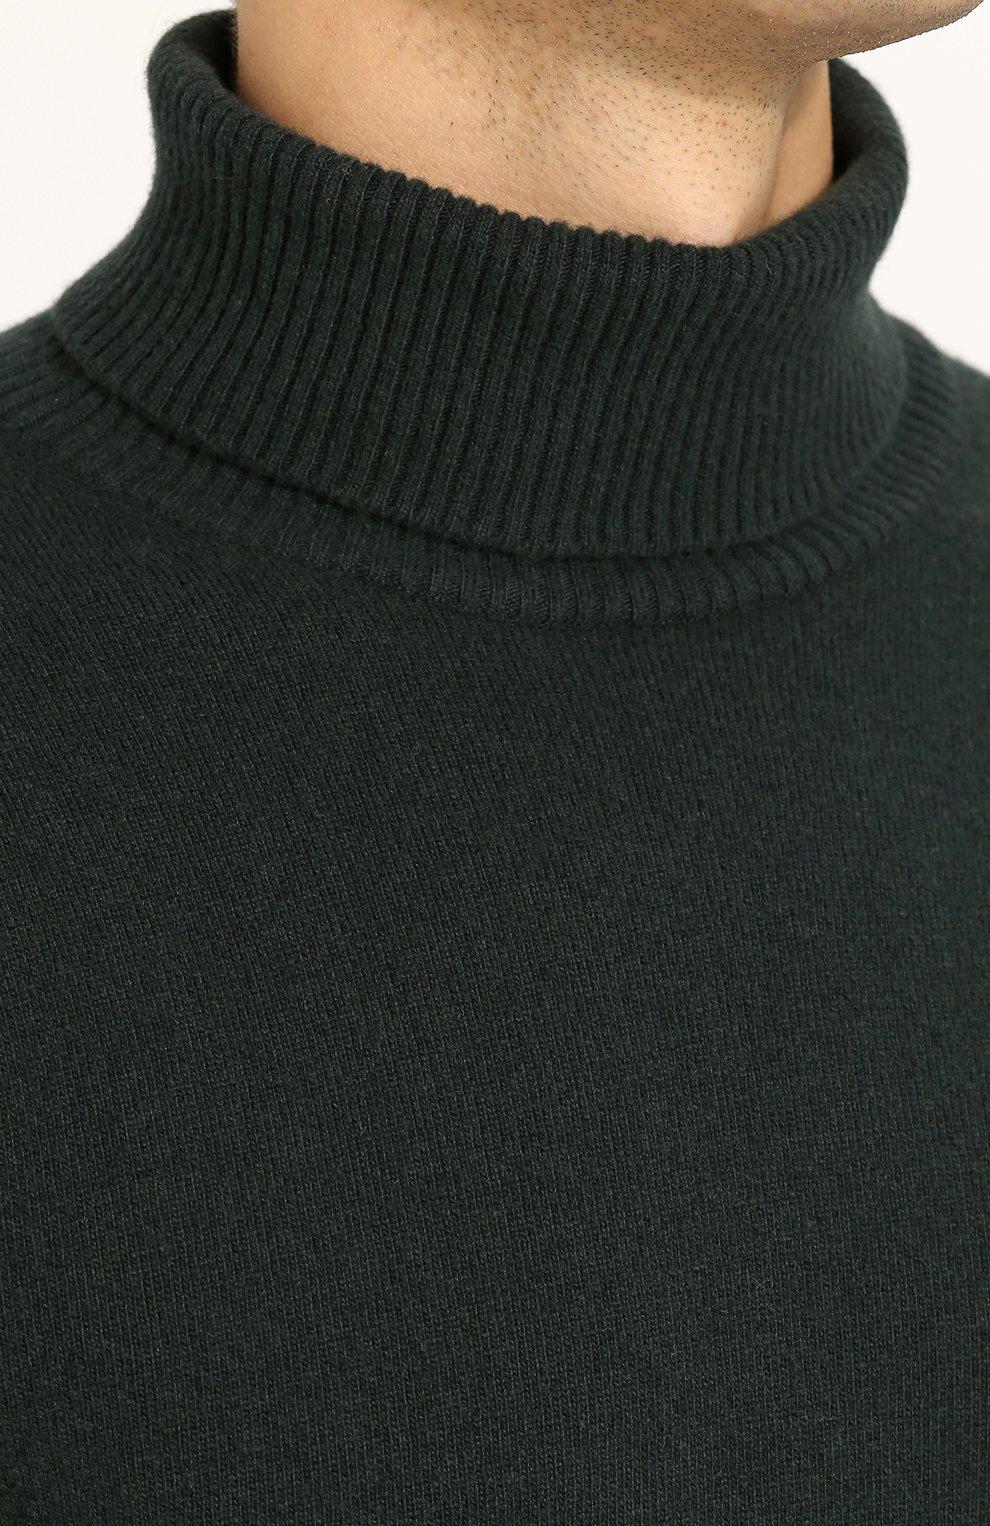 Водолазка из смеси шерсти и кашемира | Фото №5